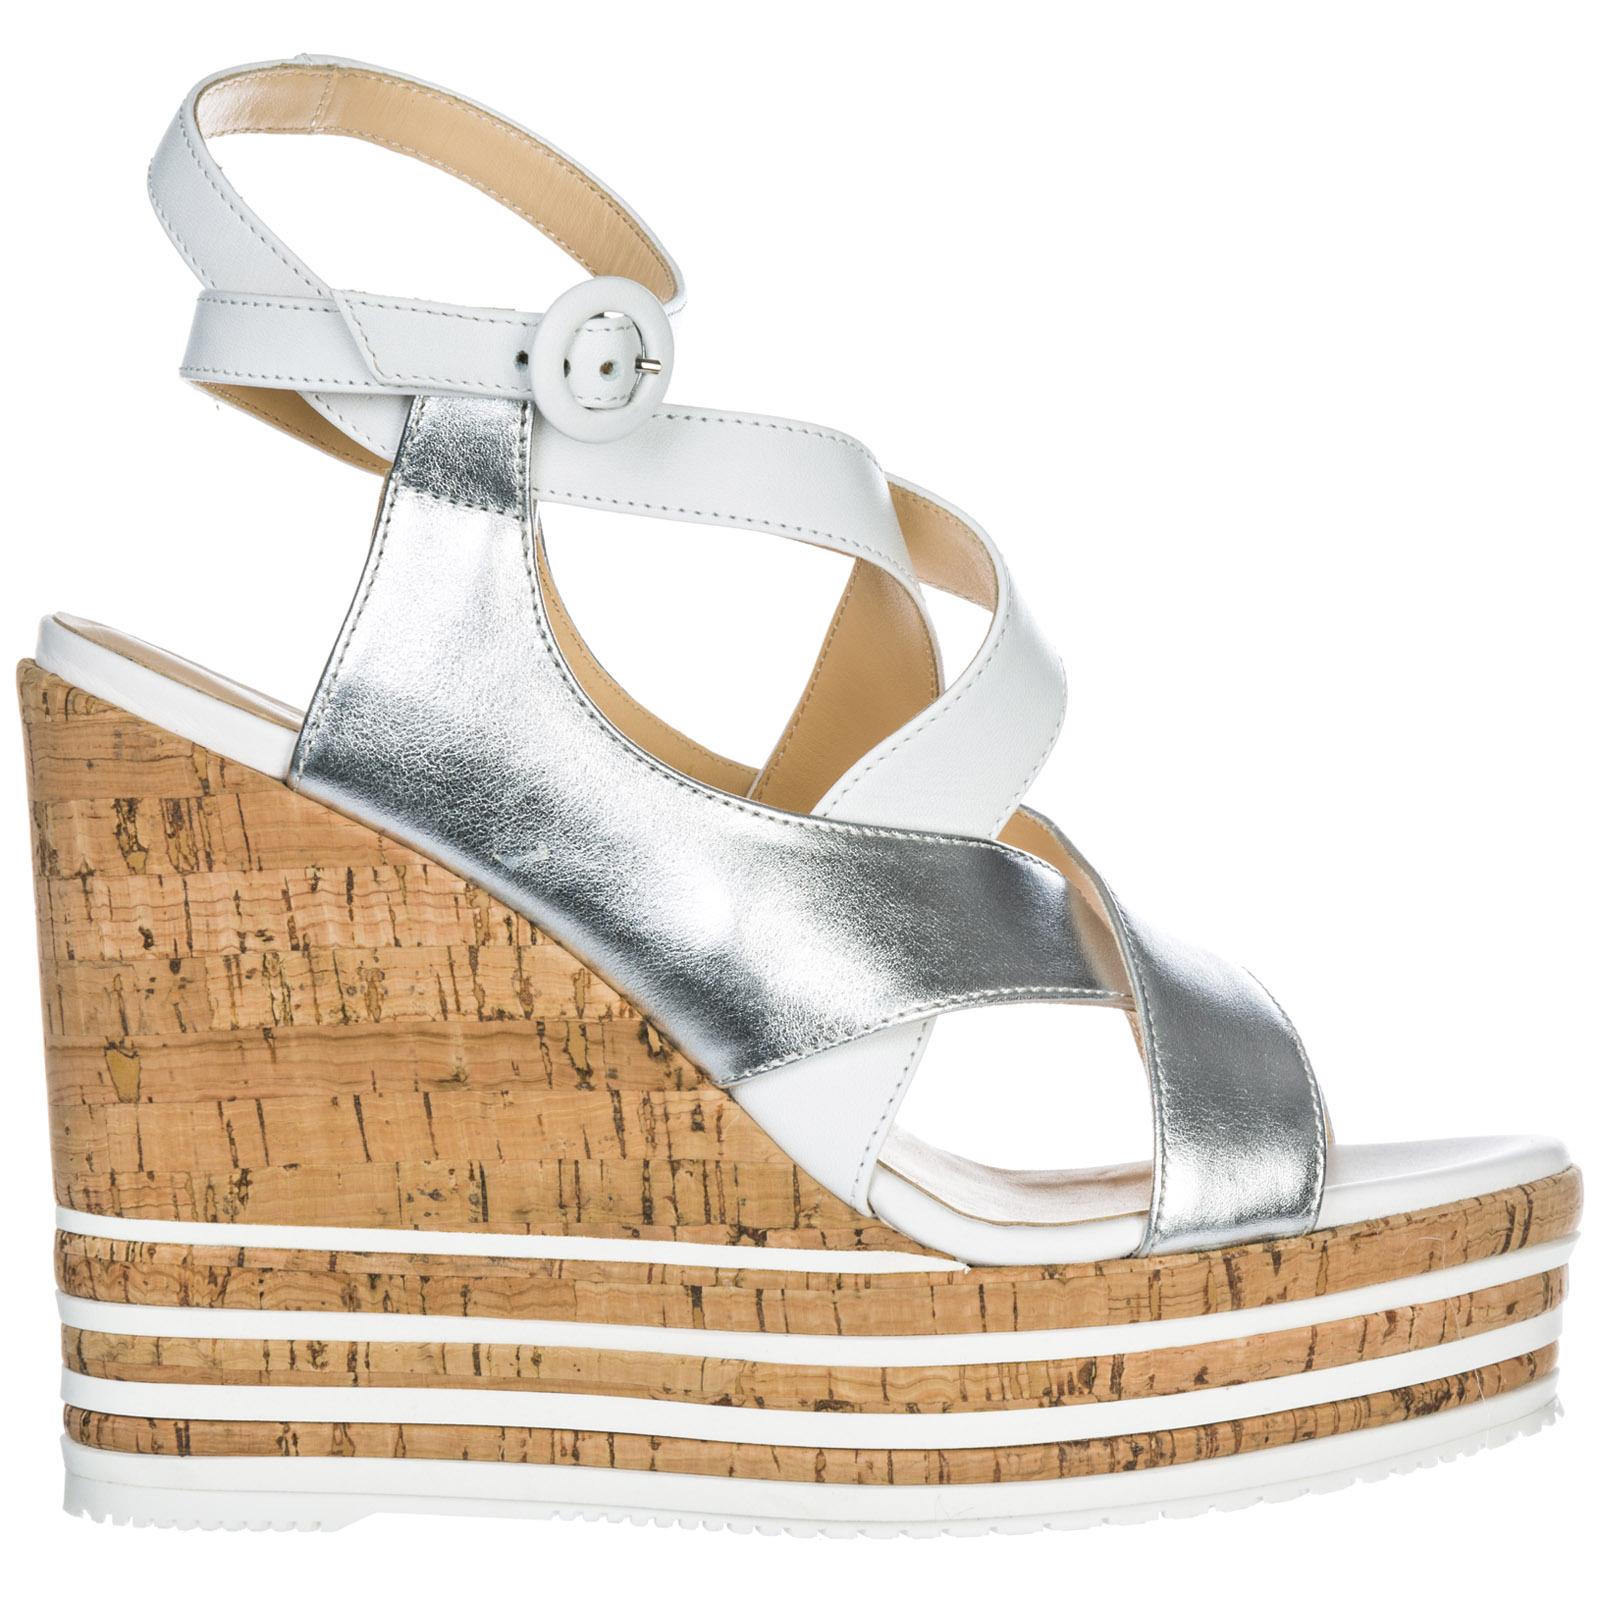 6a36b87286 Zeppe sandali donna in pelle h361